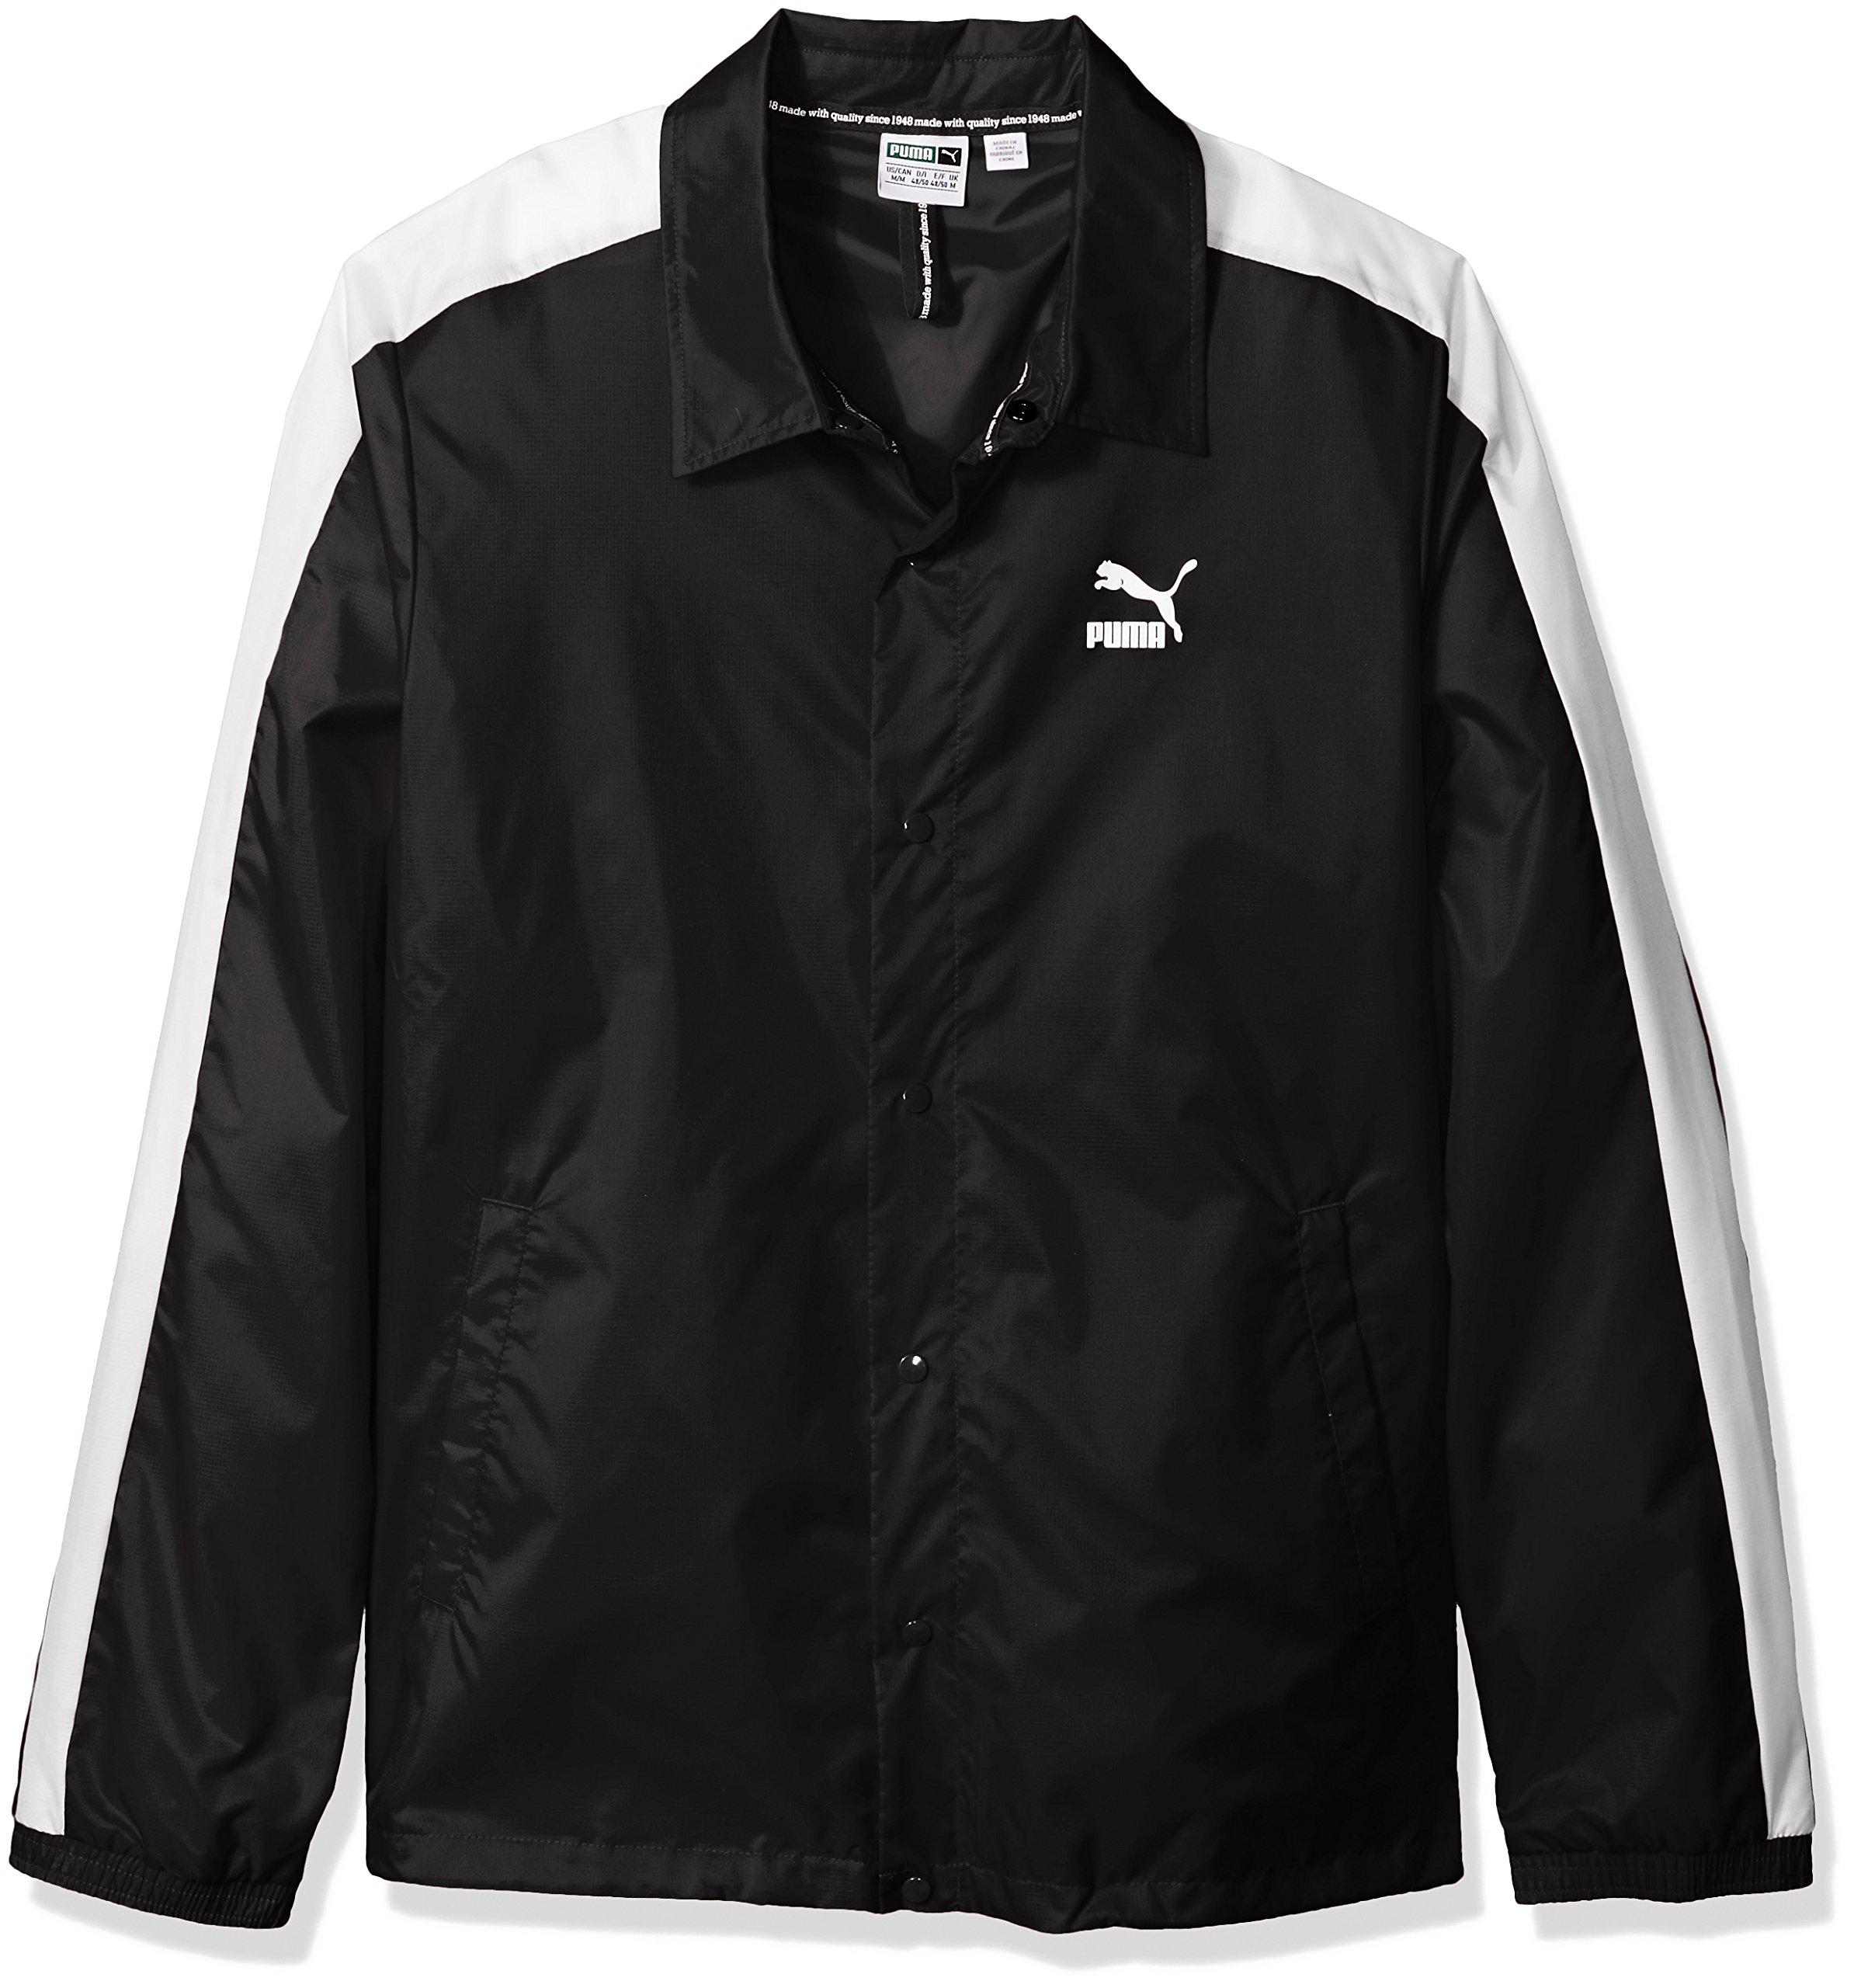 PUMA Men's Archive Coach Jacket, Black, XXL